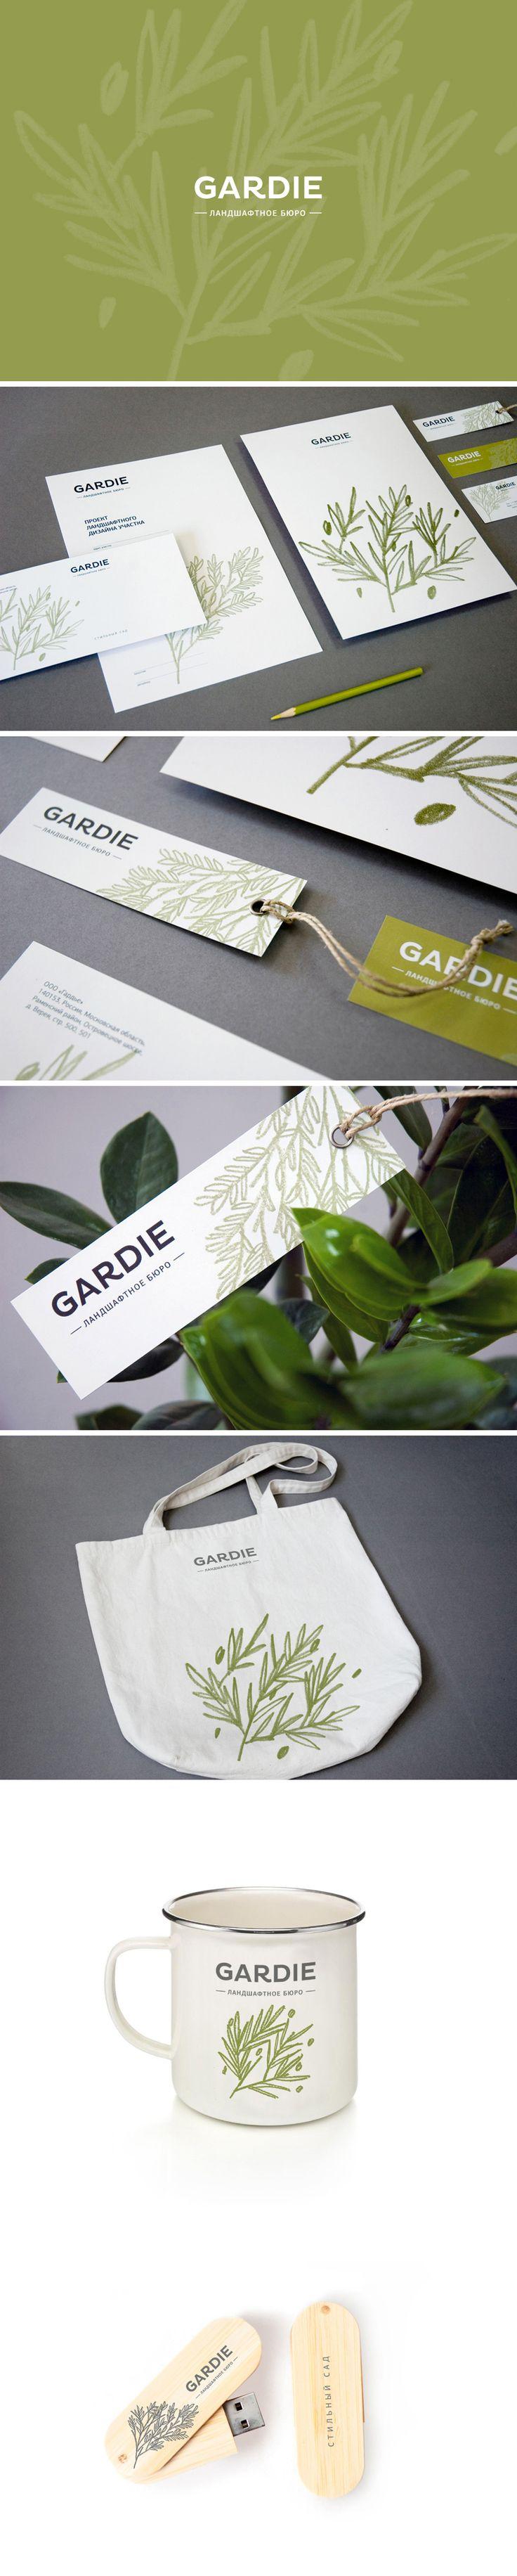 visual identity / gardie | #stationary #corporate #design #corporatedesign #logo #identity #branding #marketing